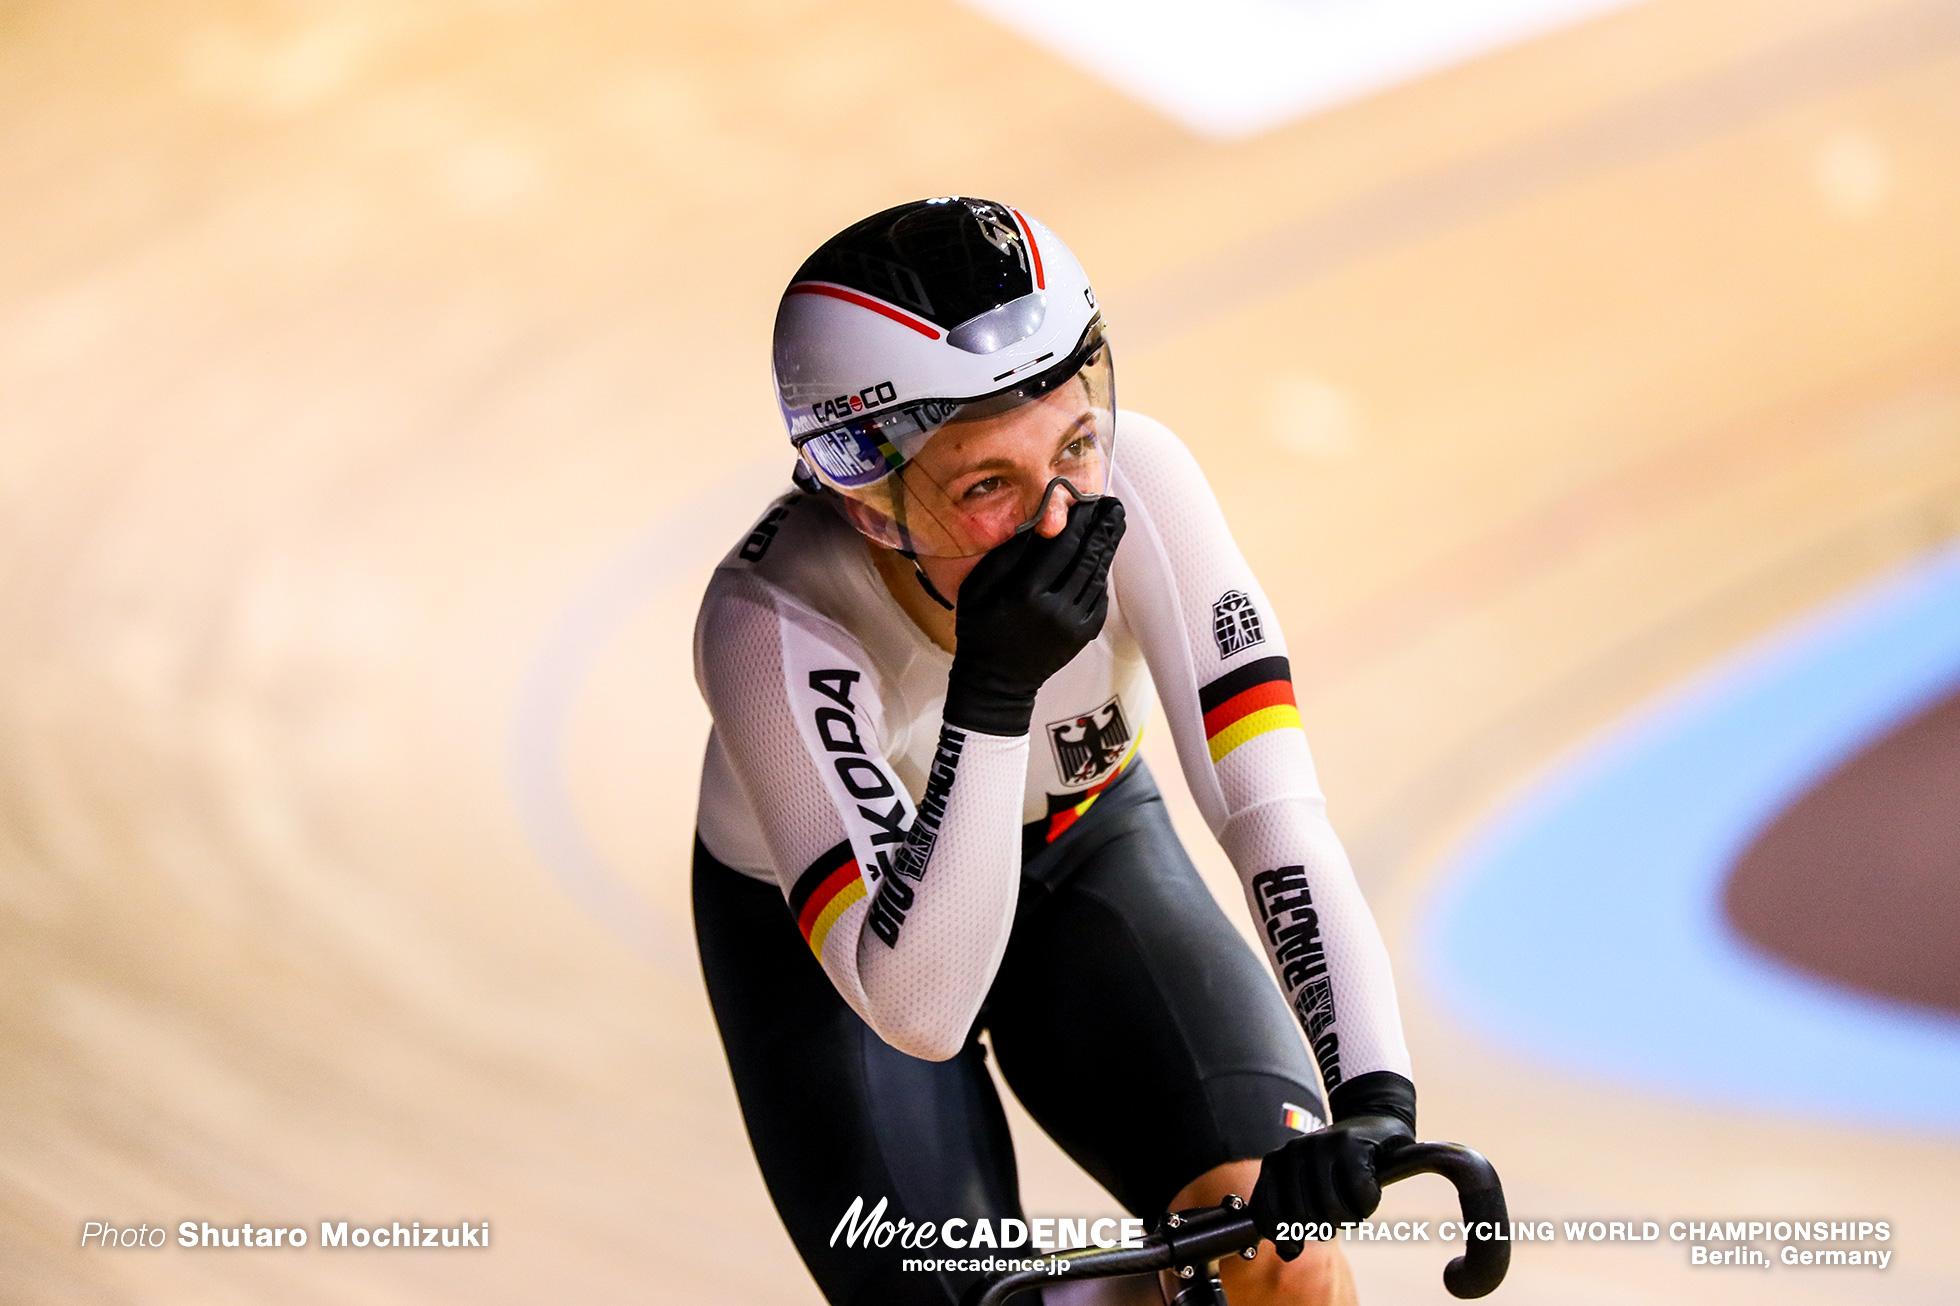 Women's Team Sprint / 2020 Track Cycling World Championships, Emma Hinze エマ・ヒンツェ